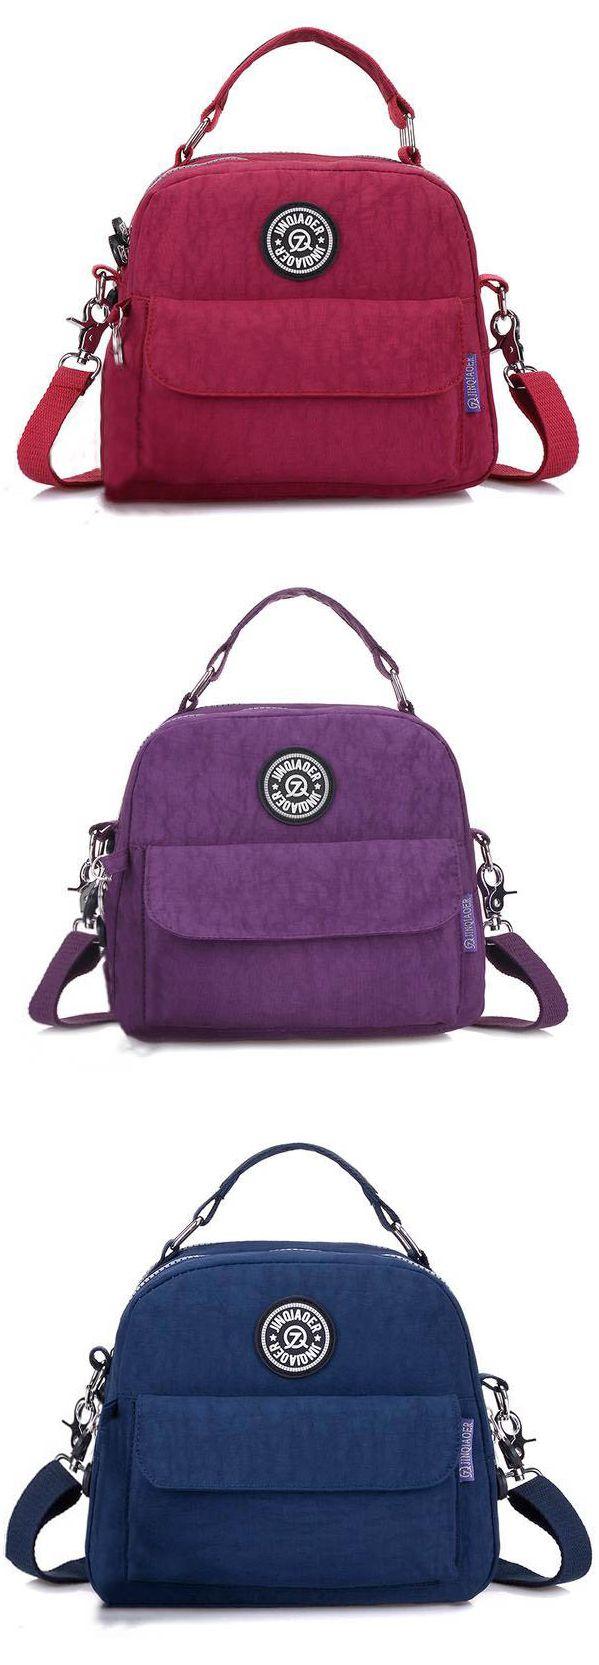 US$16.79 Women Waterproof Casual Portable Totes Crossbody Bags Shoulder Bags Backpack